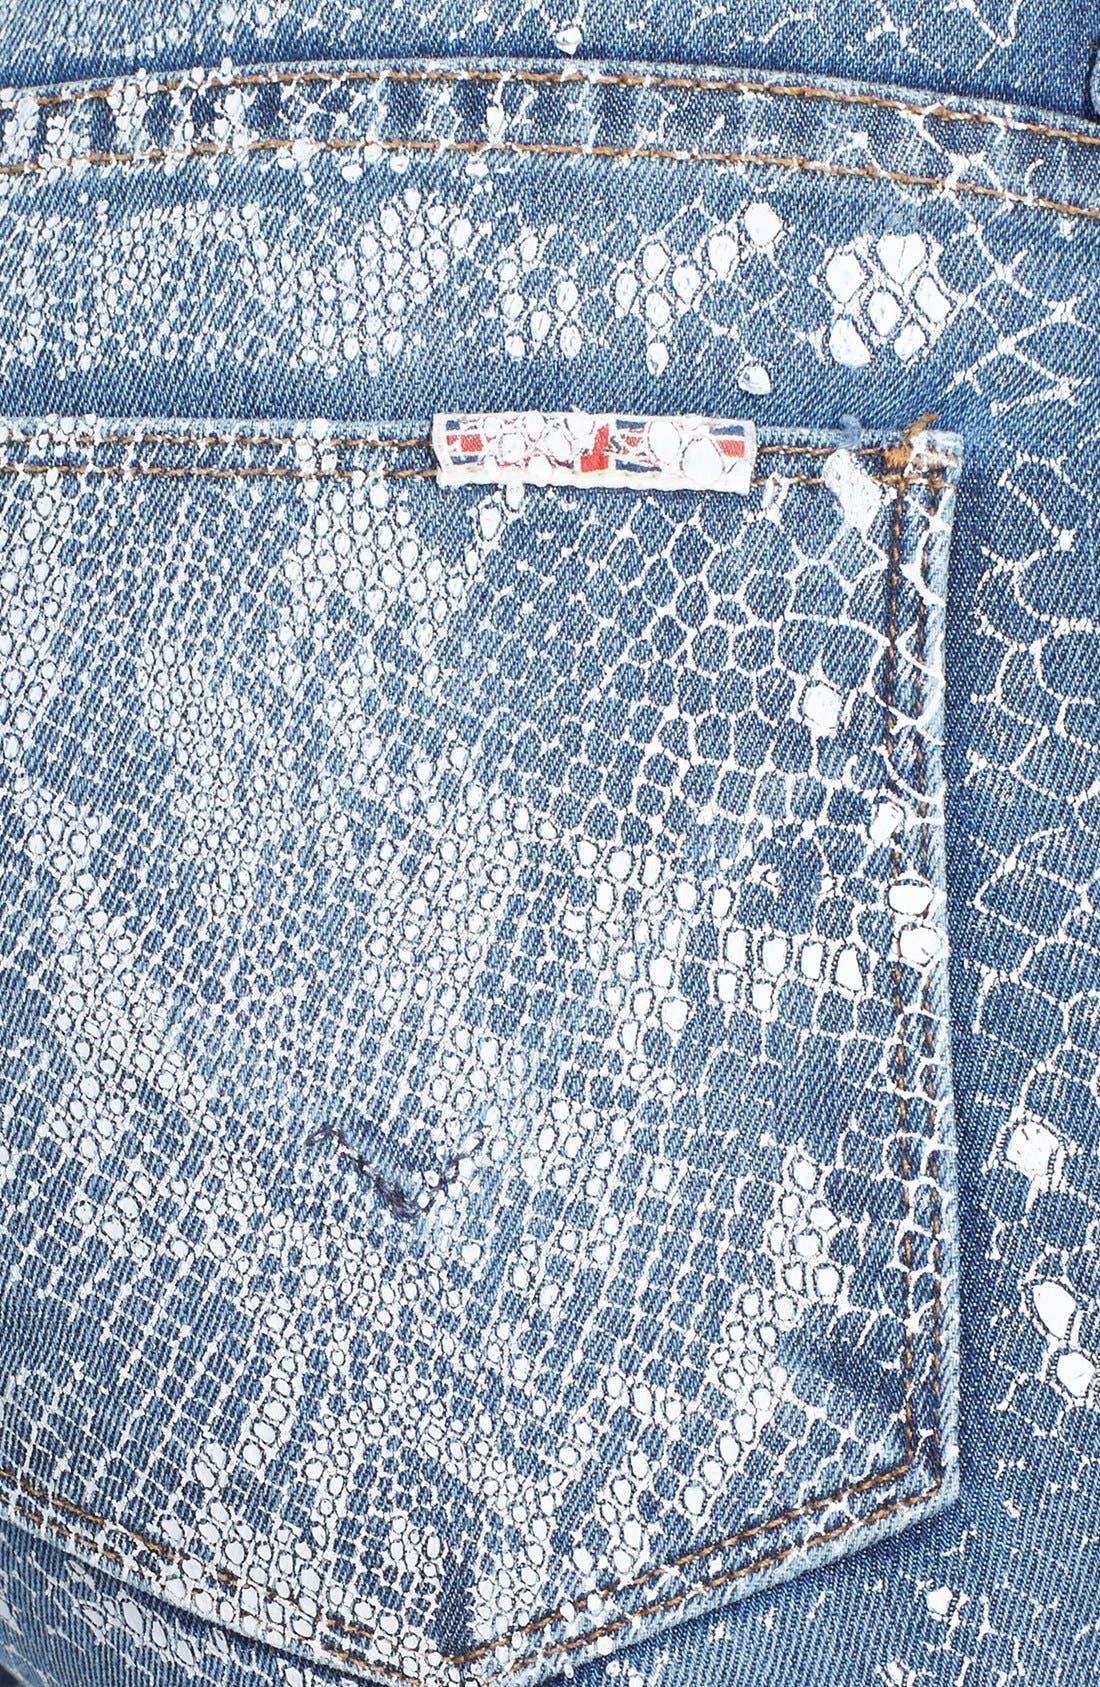 Alternate Image 3  - Hudson Jeans 'Nico' Print Skinny Stretch Jeans (Copperhead)